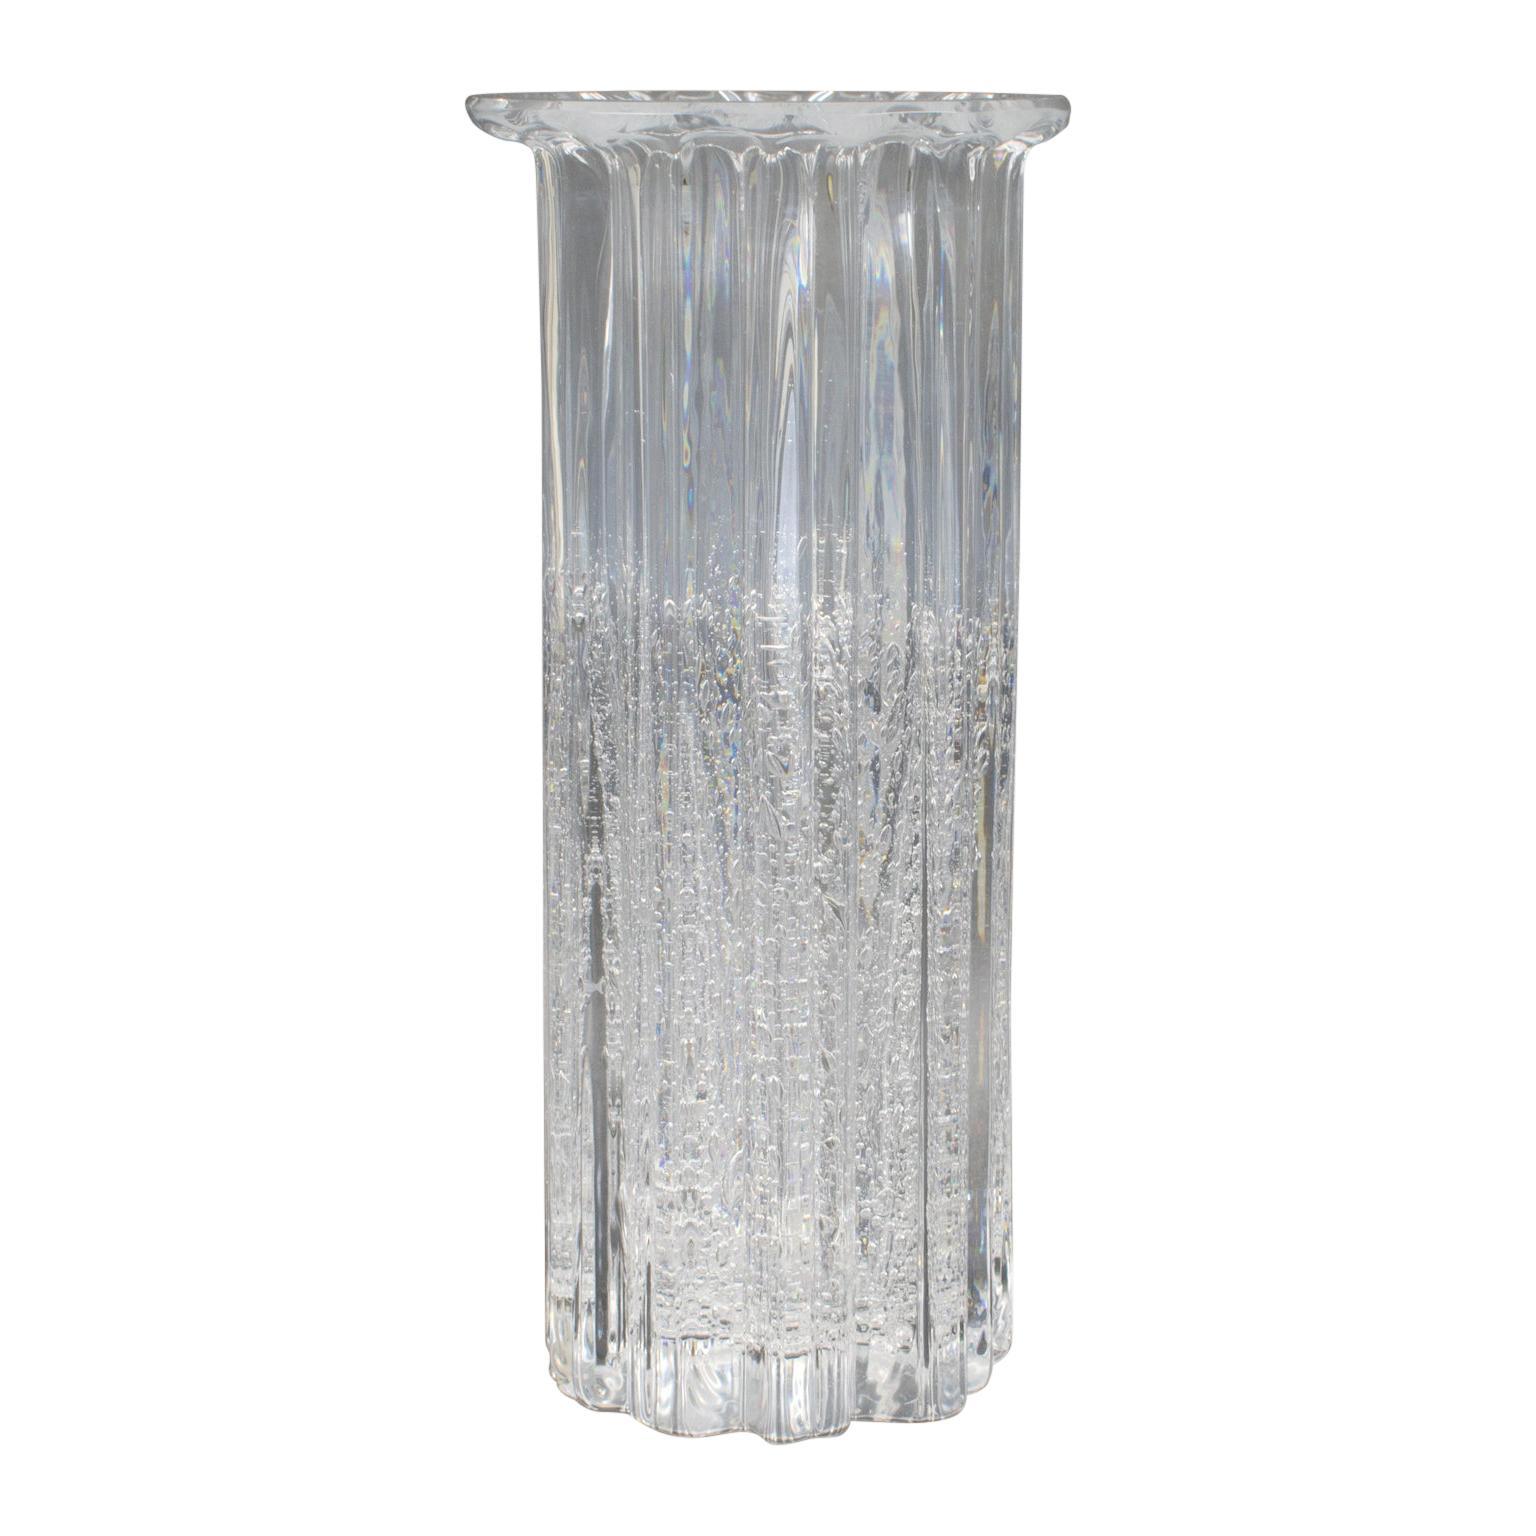 "Willy Johansson for Hadeland Norway Art-Glass ""Atlantic"" Tall Vase"